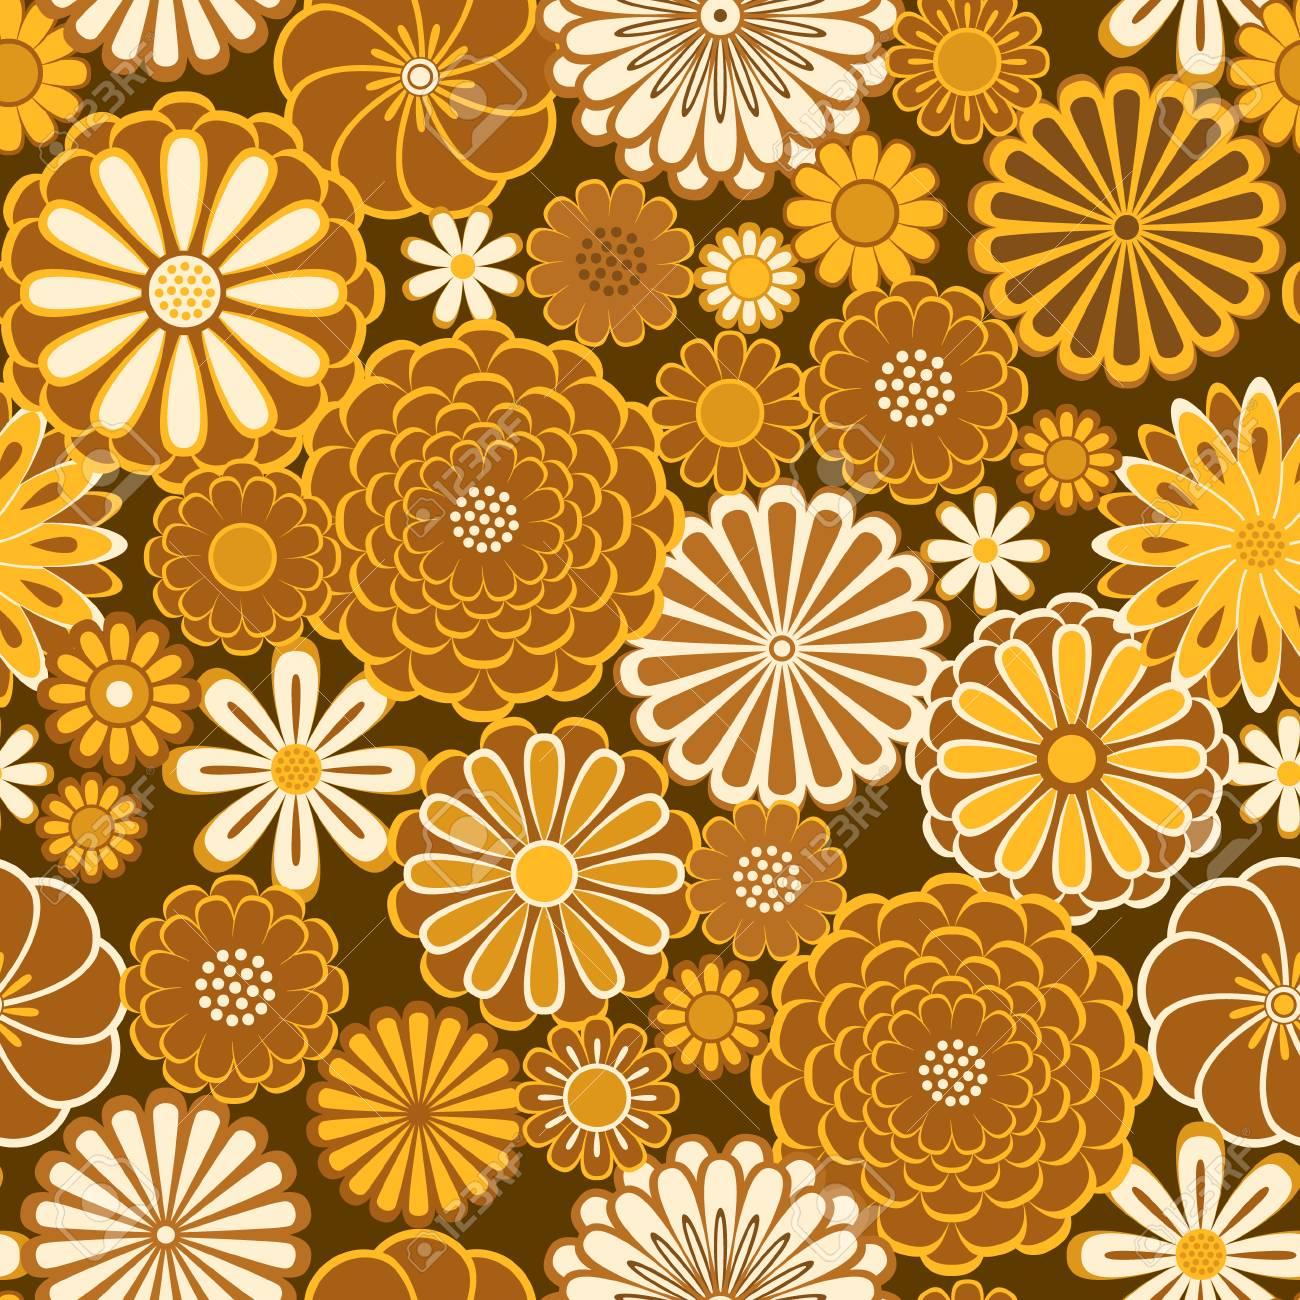 Golden orange circle daisy flowers natural seamless pattern, vector - 98699204